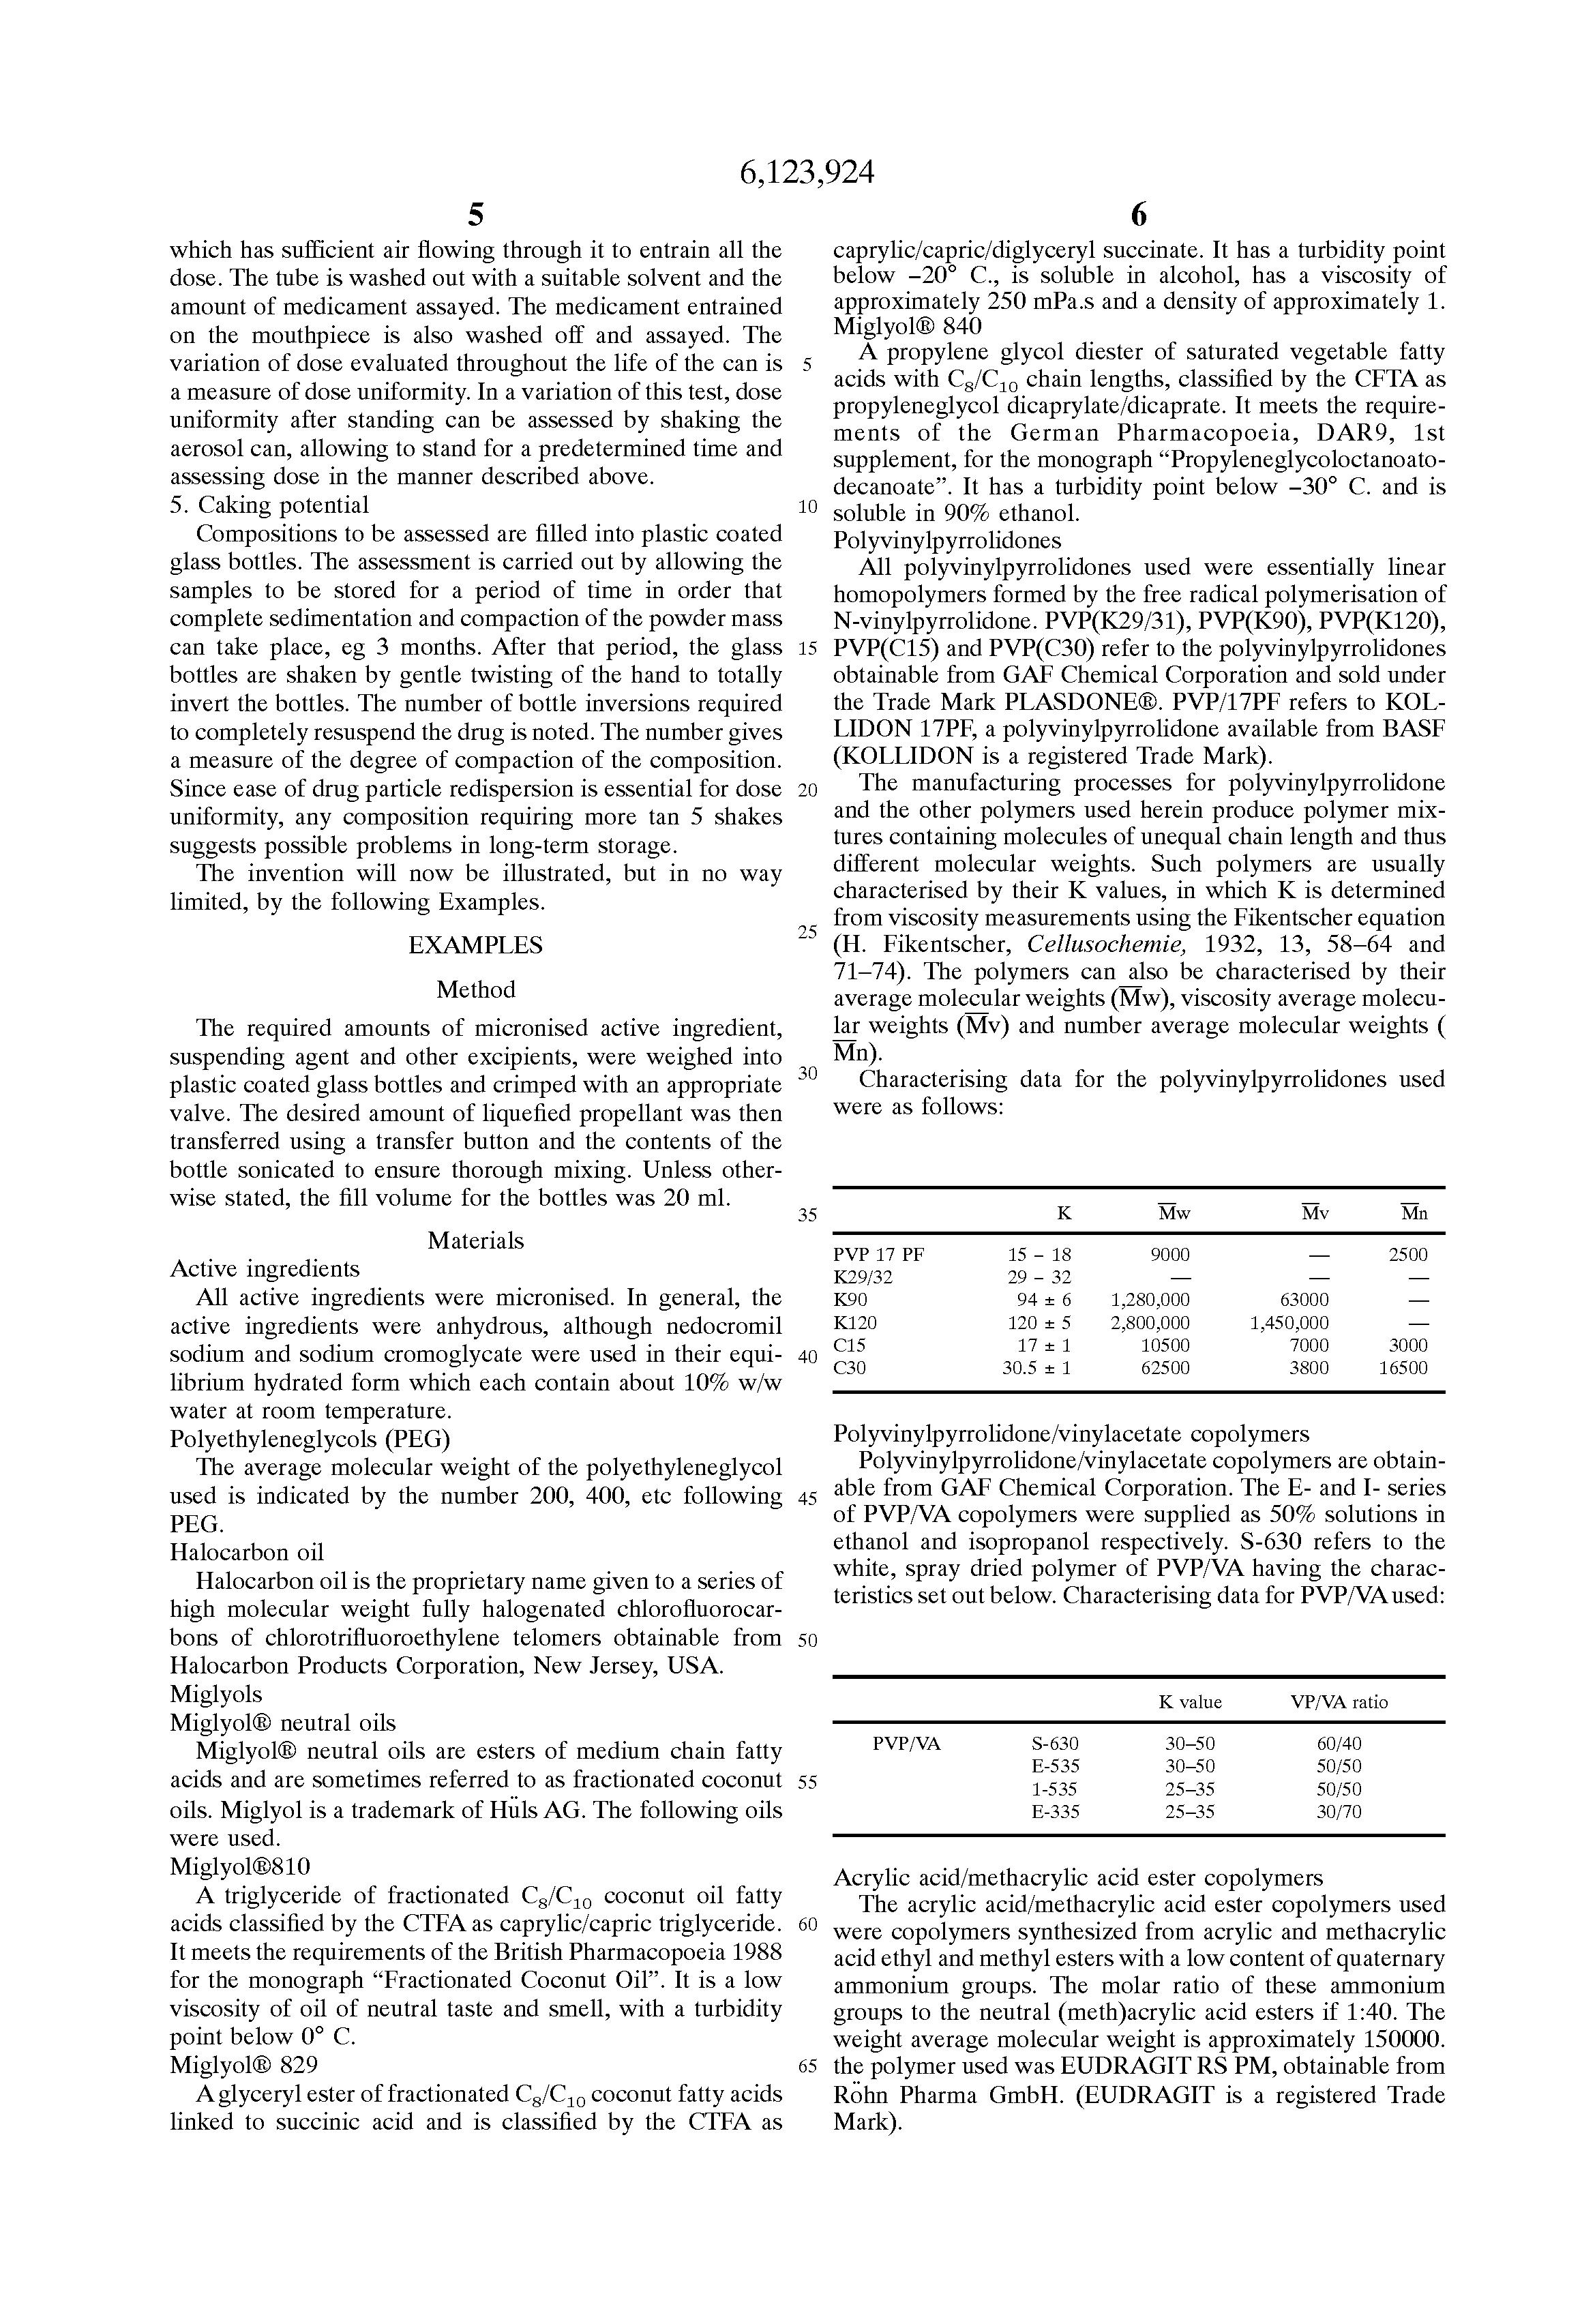 fenoterol hydrobromide steroid